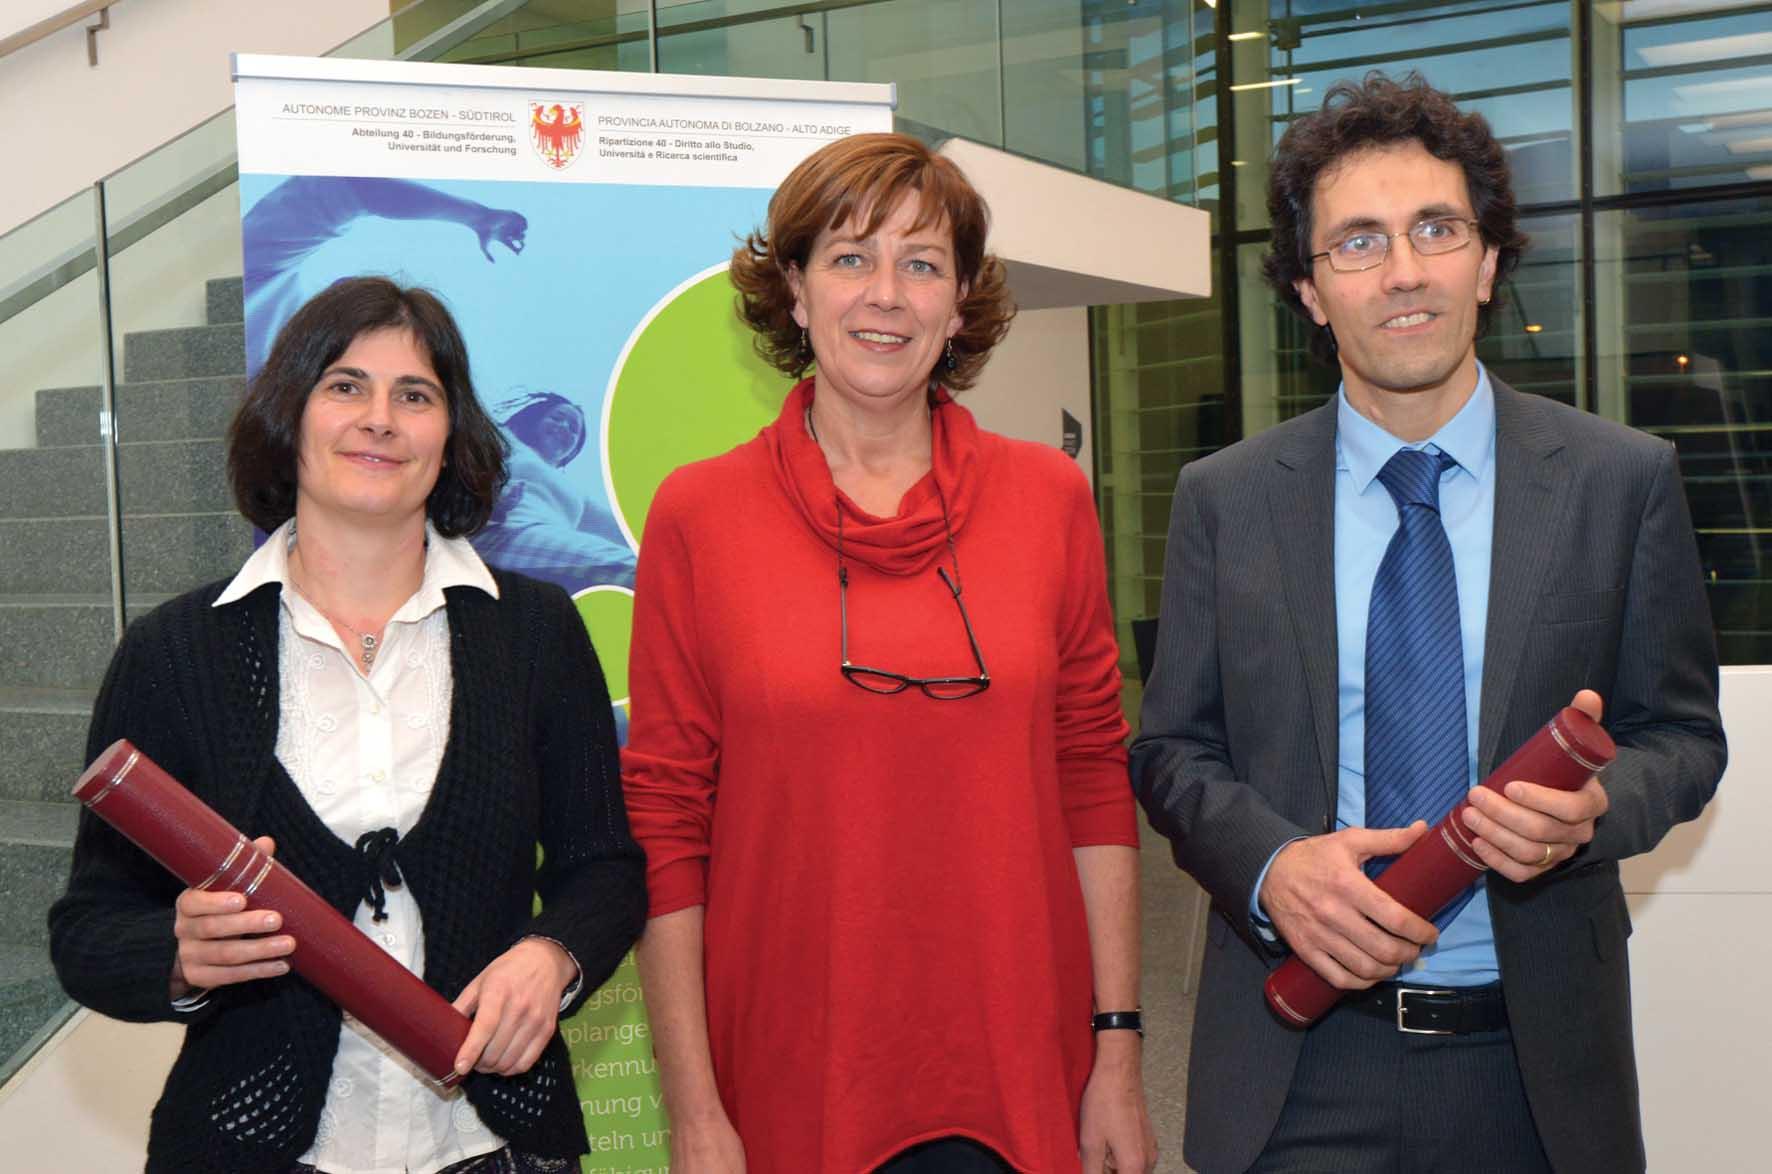 PAB-premio-Ricerca-e-Premio-Scientifico-2013-da-sx-Barbara-Beikircher-Ass.-Sabina-Kasslatter-Mur-Diego-Calvanese-ilnordest-quotidiano 1